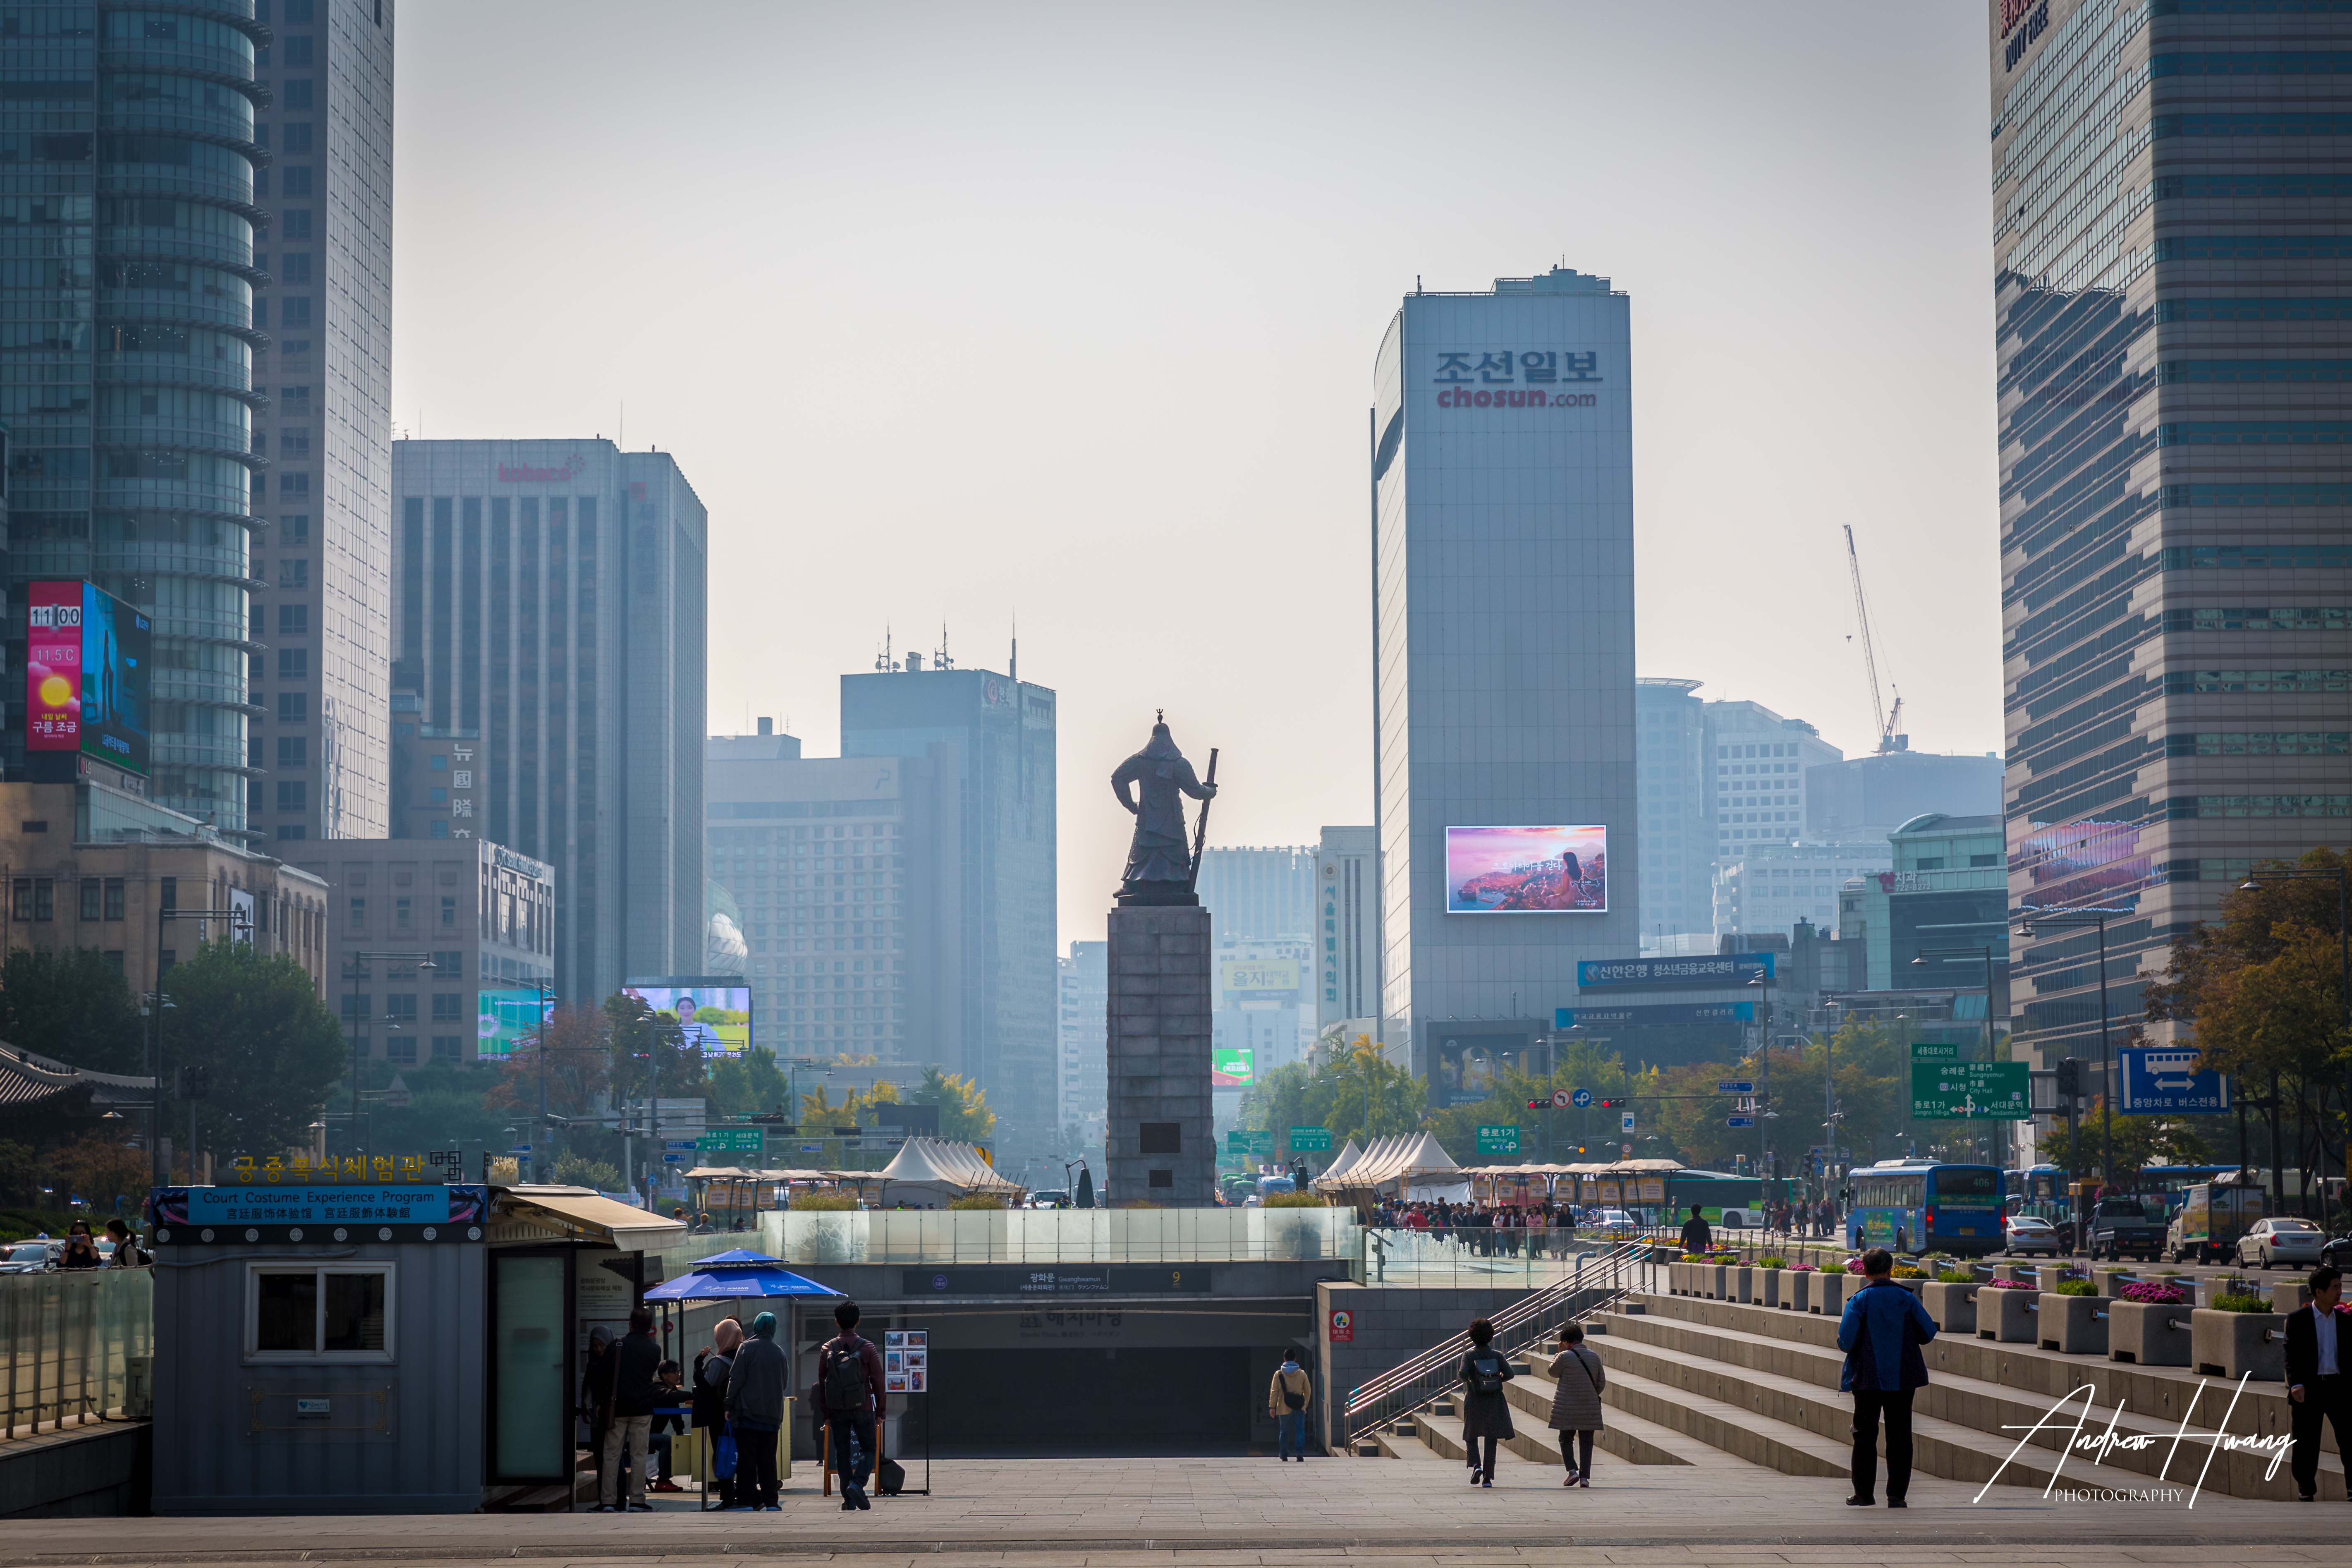 Gwanghwamun Square Seoul